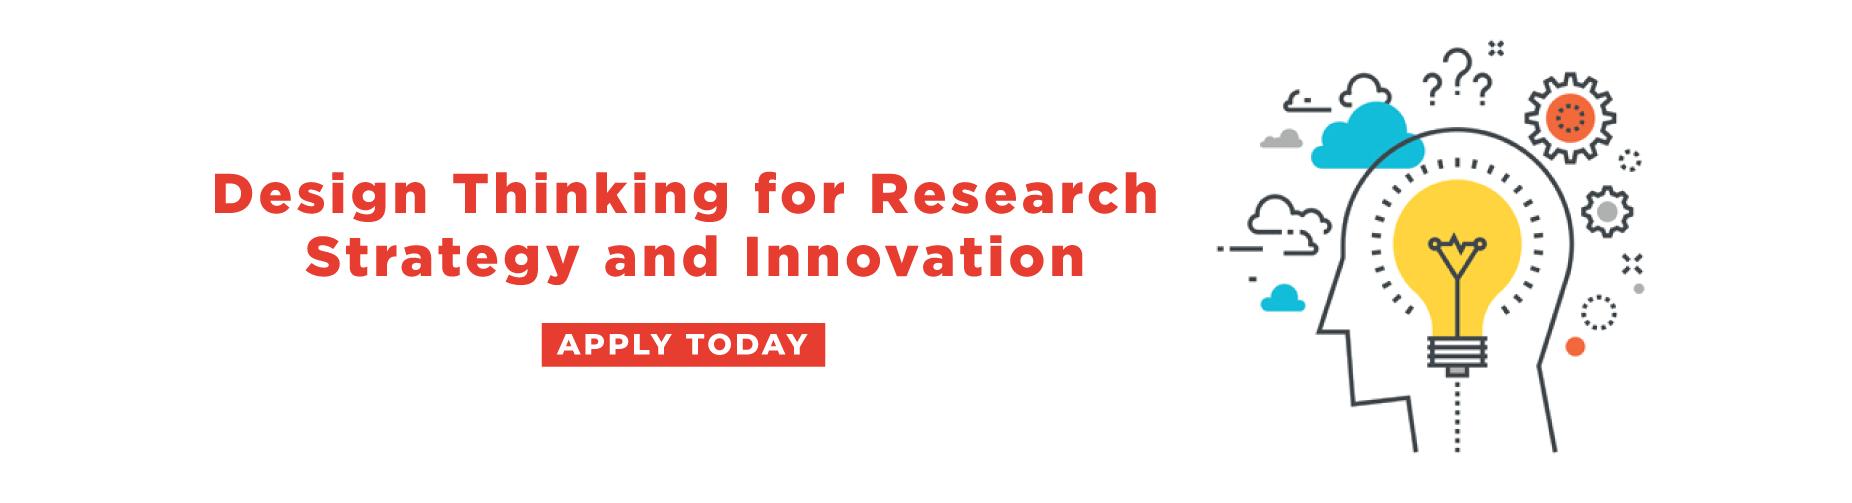 Design-Thinking-Web-Banner